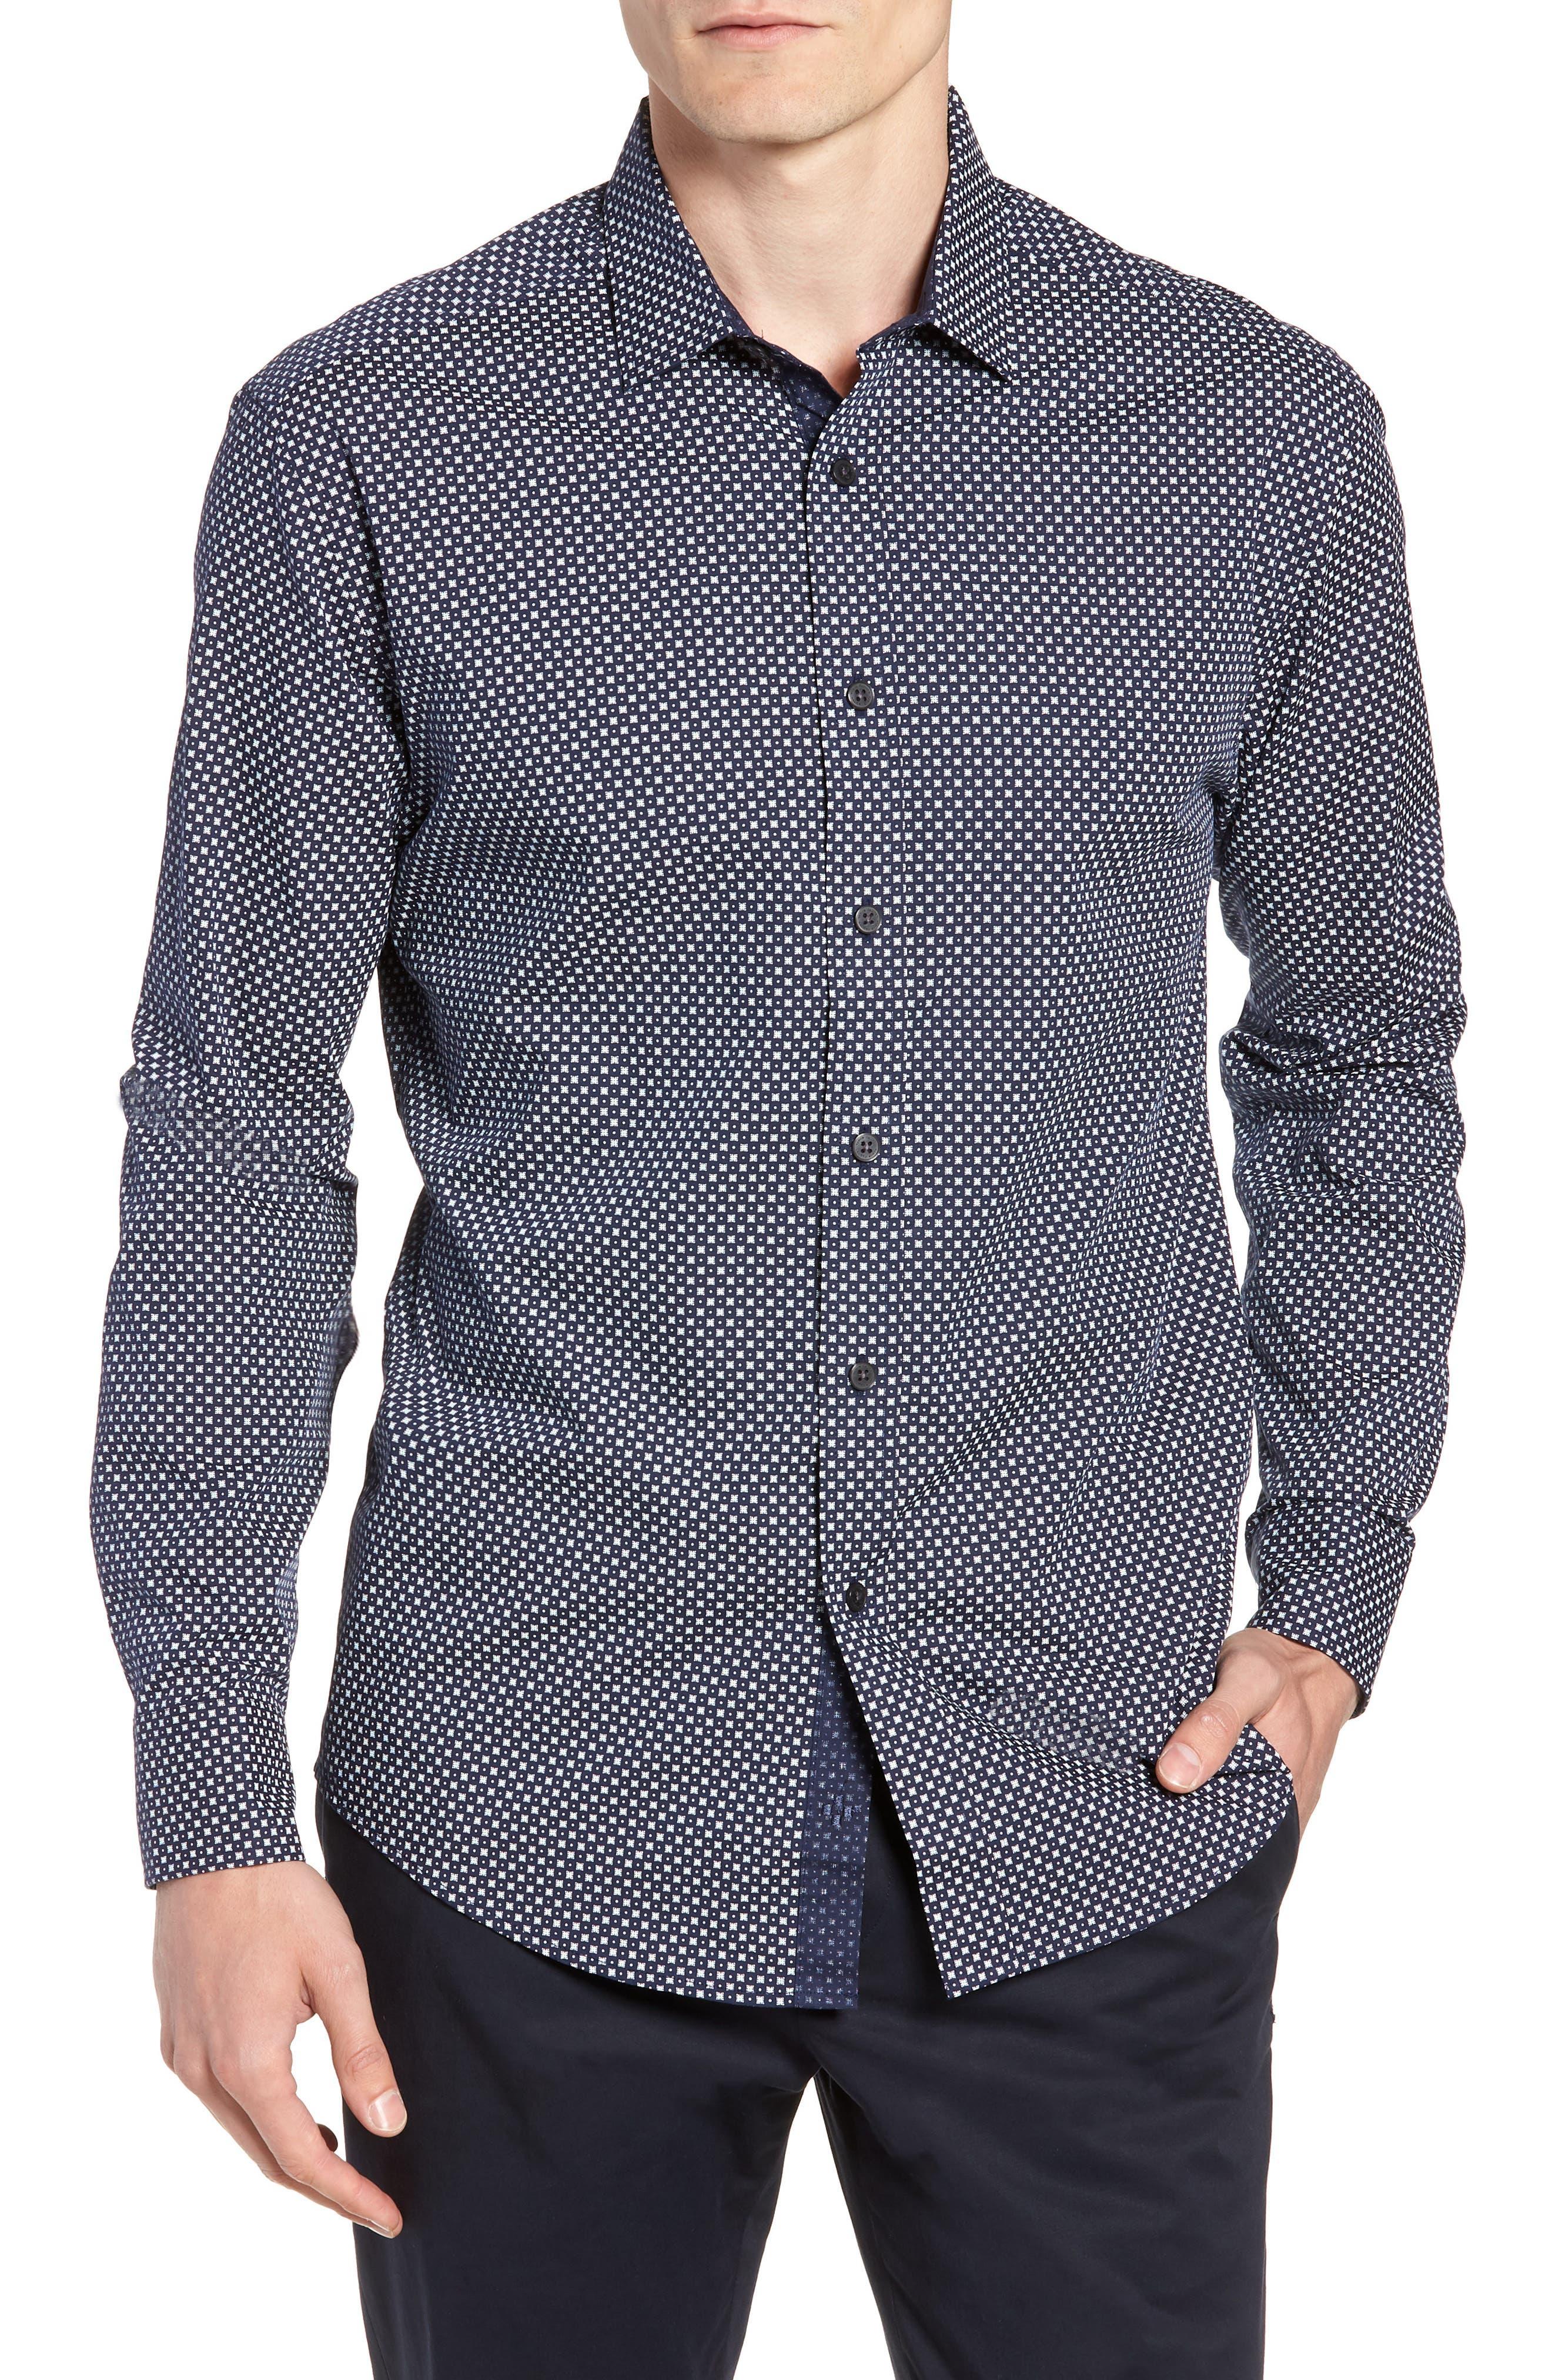 Regular Fit Geometric Dot Sport Shirt,                             Main thumbnail 1, color,                             NAVY/ WHITE POPLIN PRINT